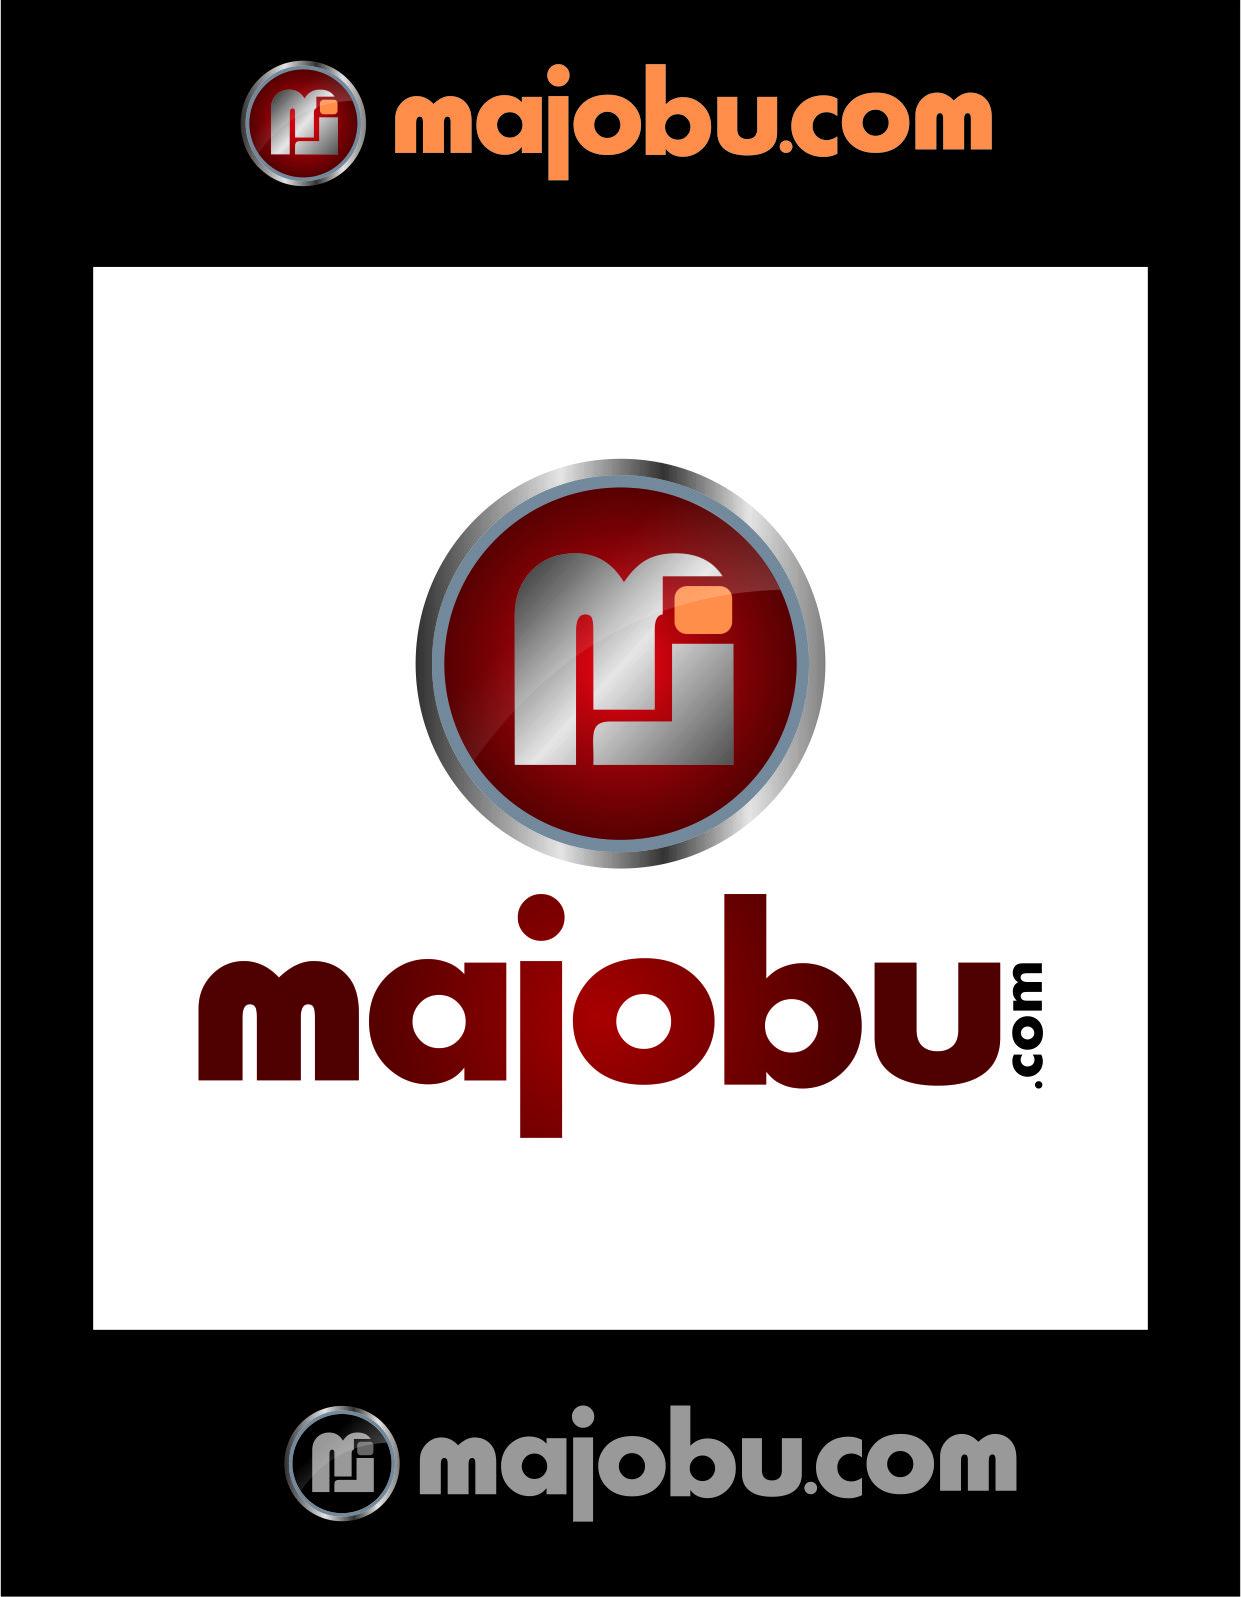 Logo Design by Agus Martoyo - Entry No. 136 in the Logo Design Contest Inspiring Logo Design for Majobu.